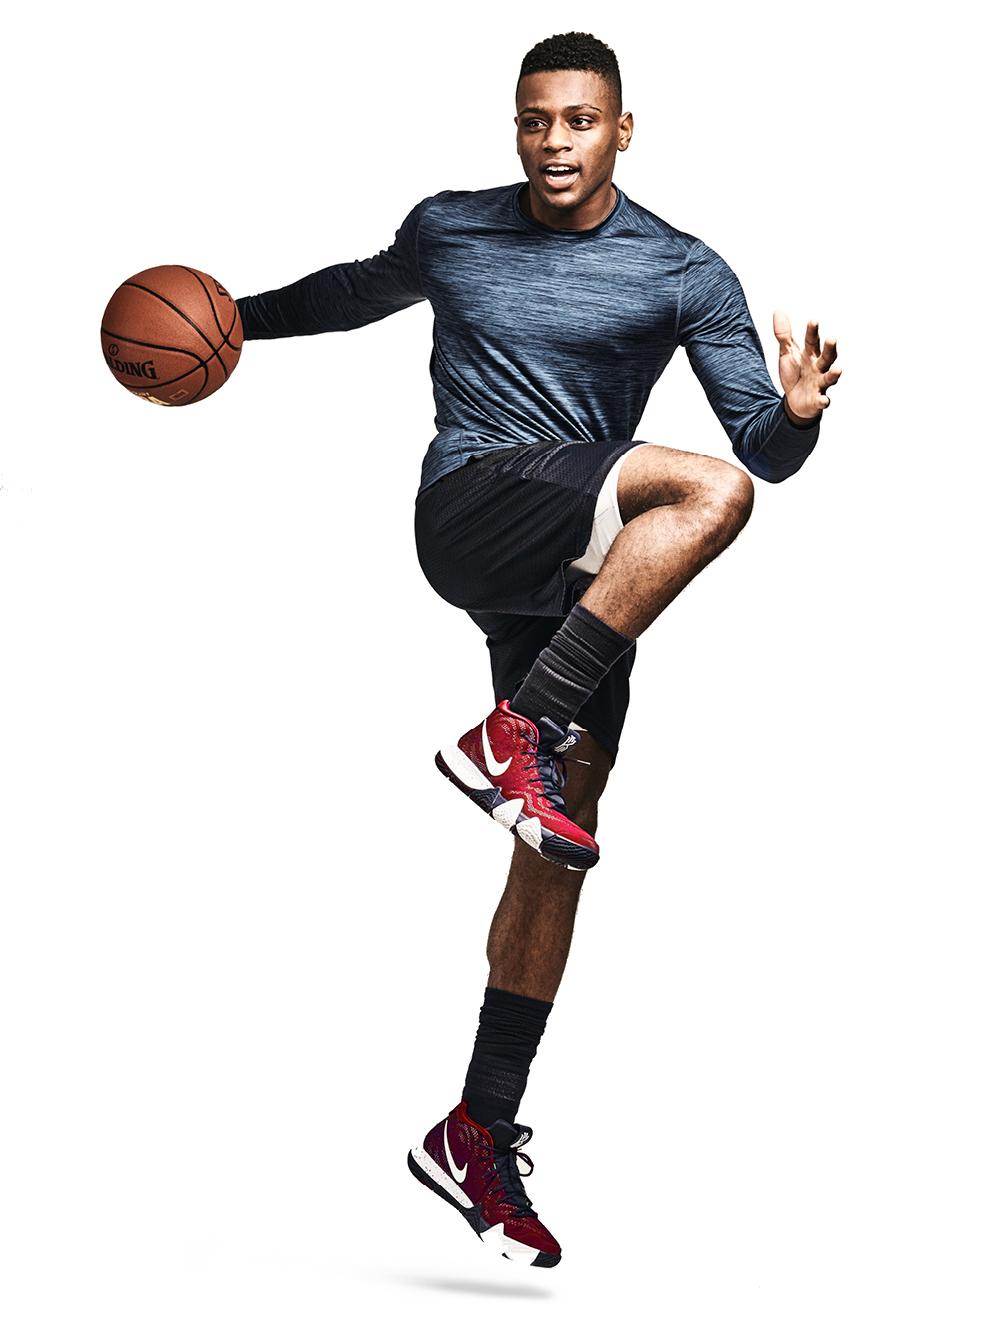 Everett_Aaron_Okayama_Basketball32.jpg